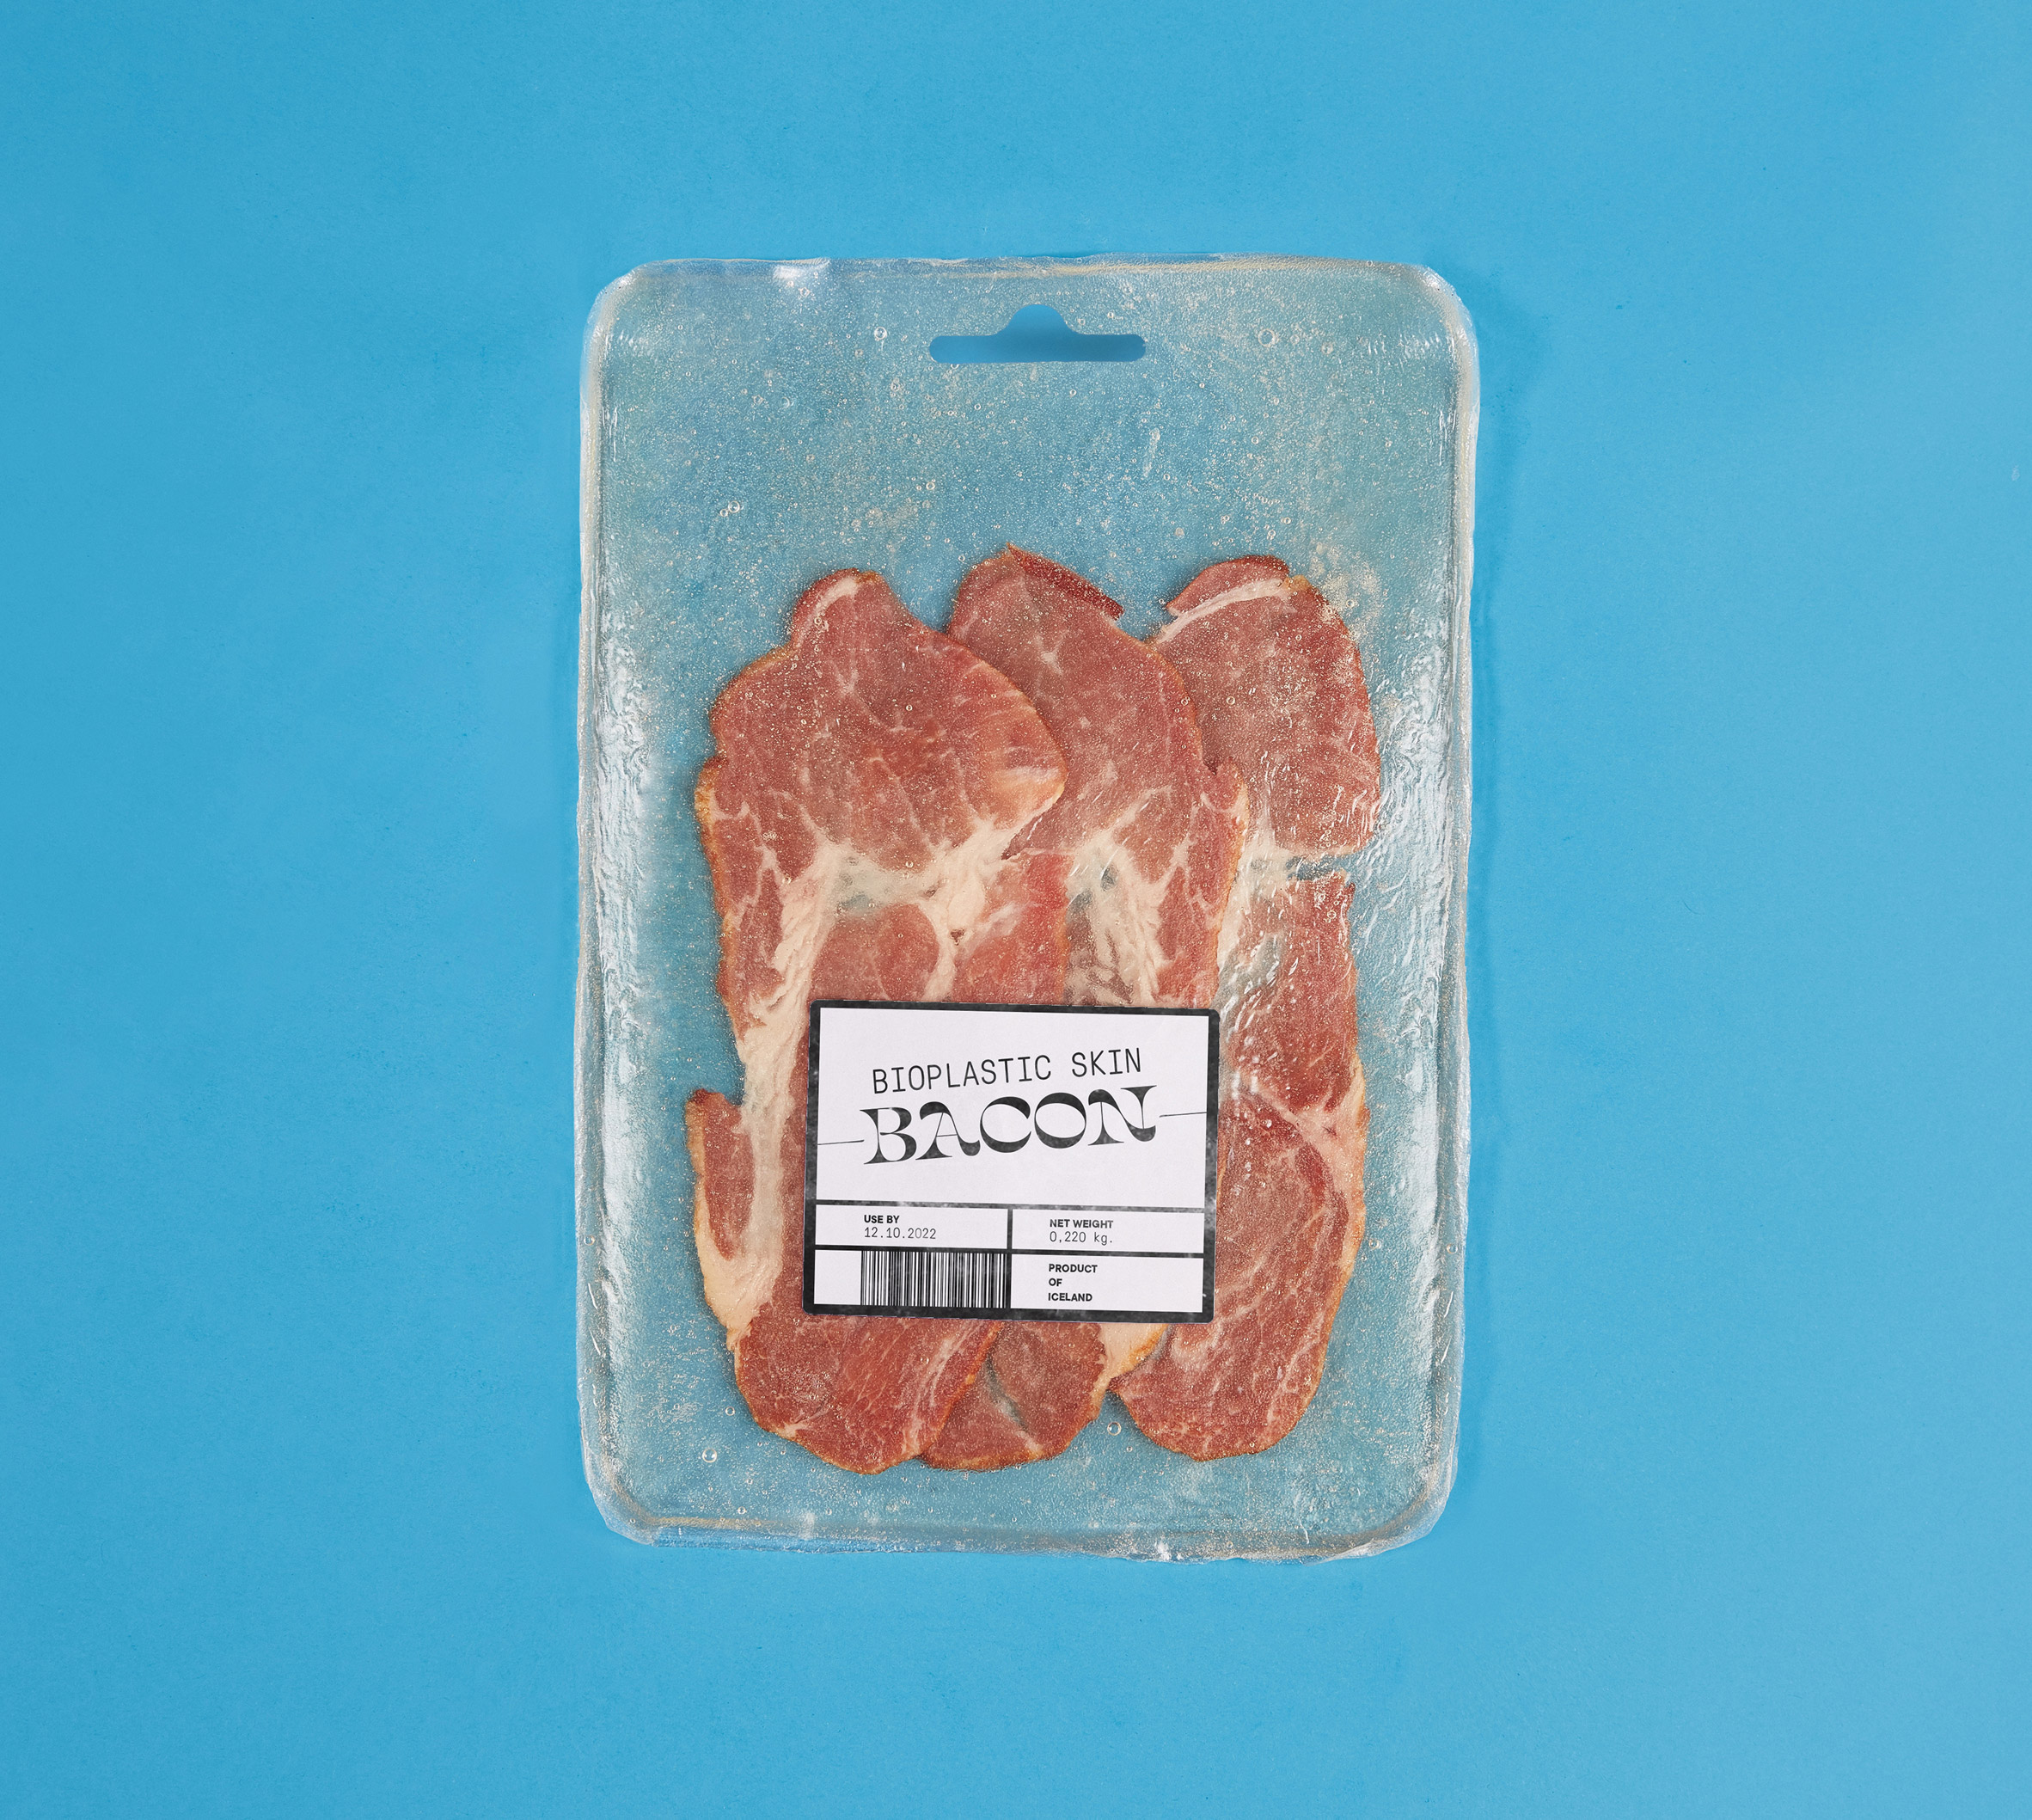 Bioplastic Skin packaging